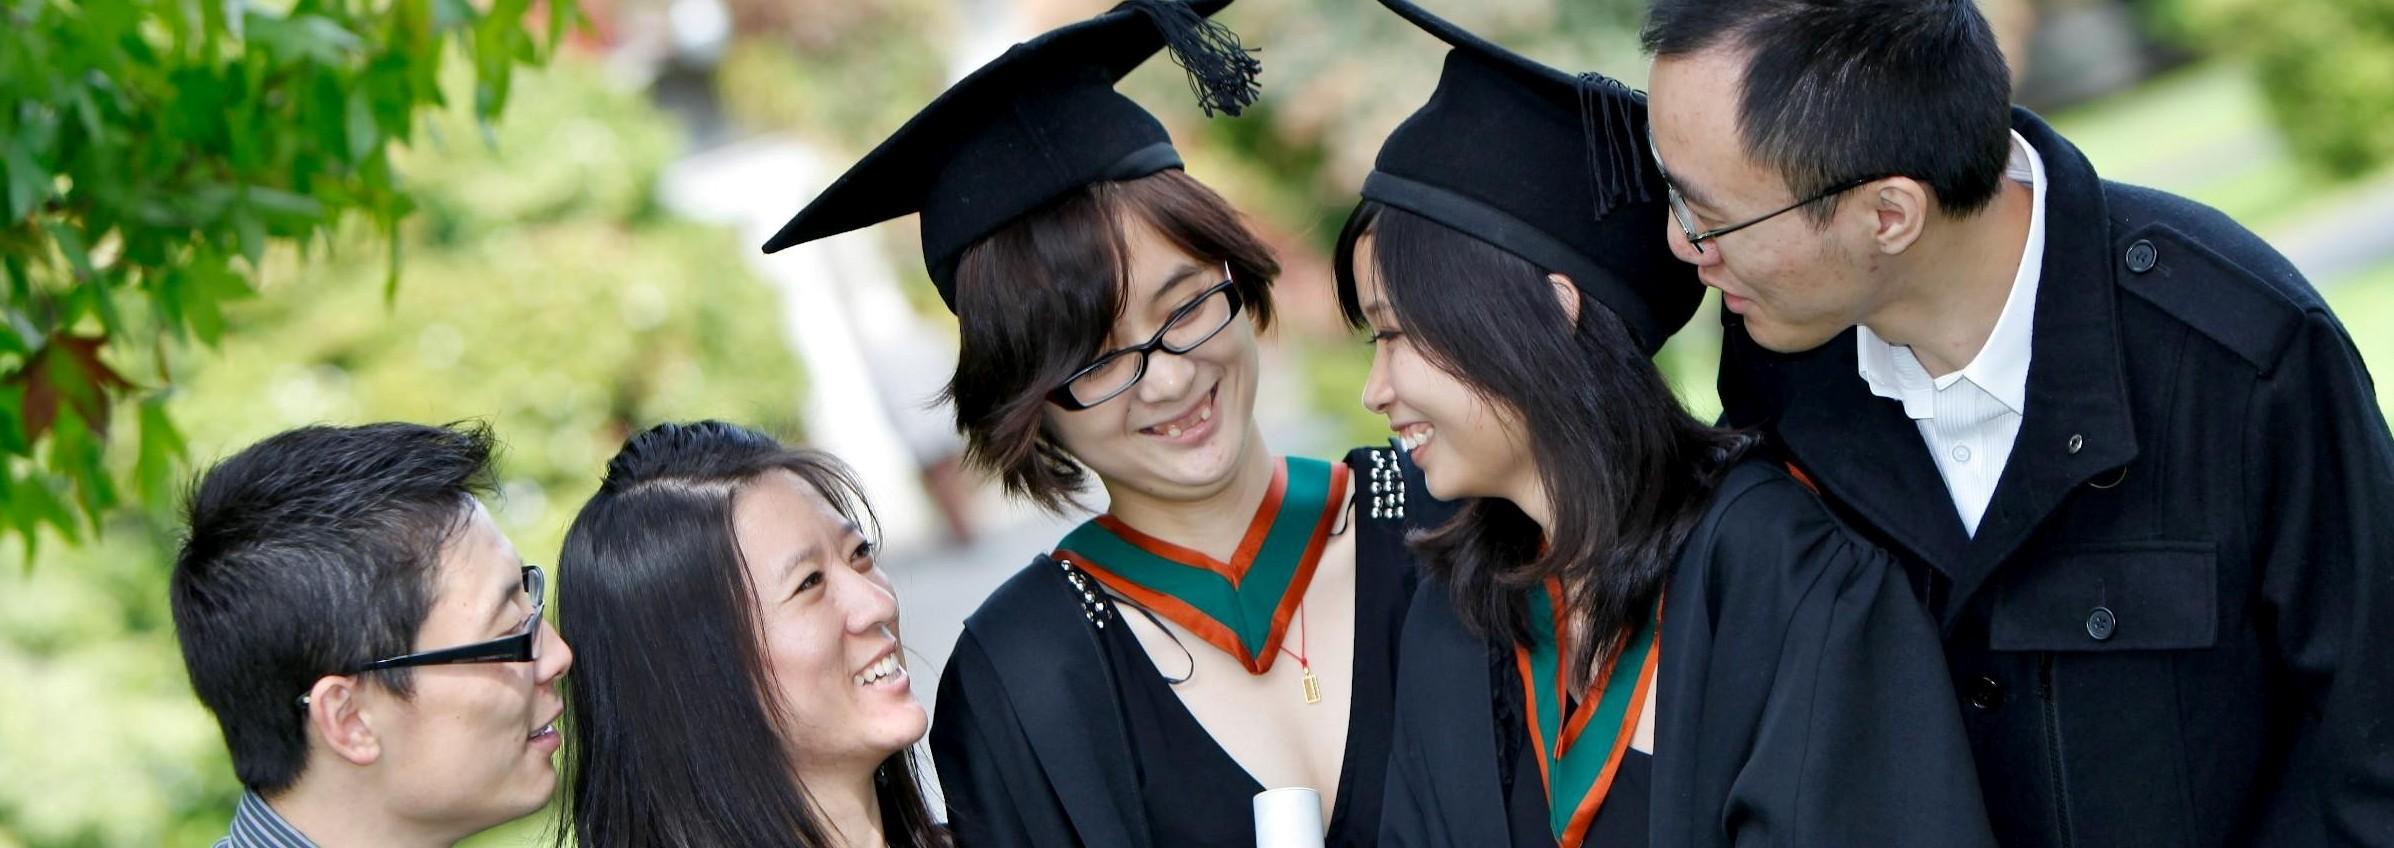 Scholarships to Study in the UK | Top Universities